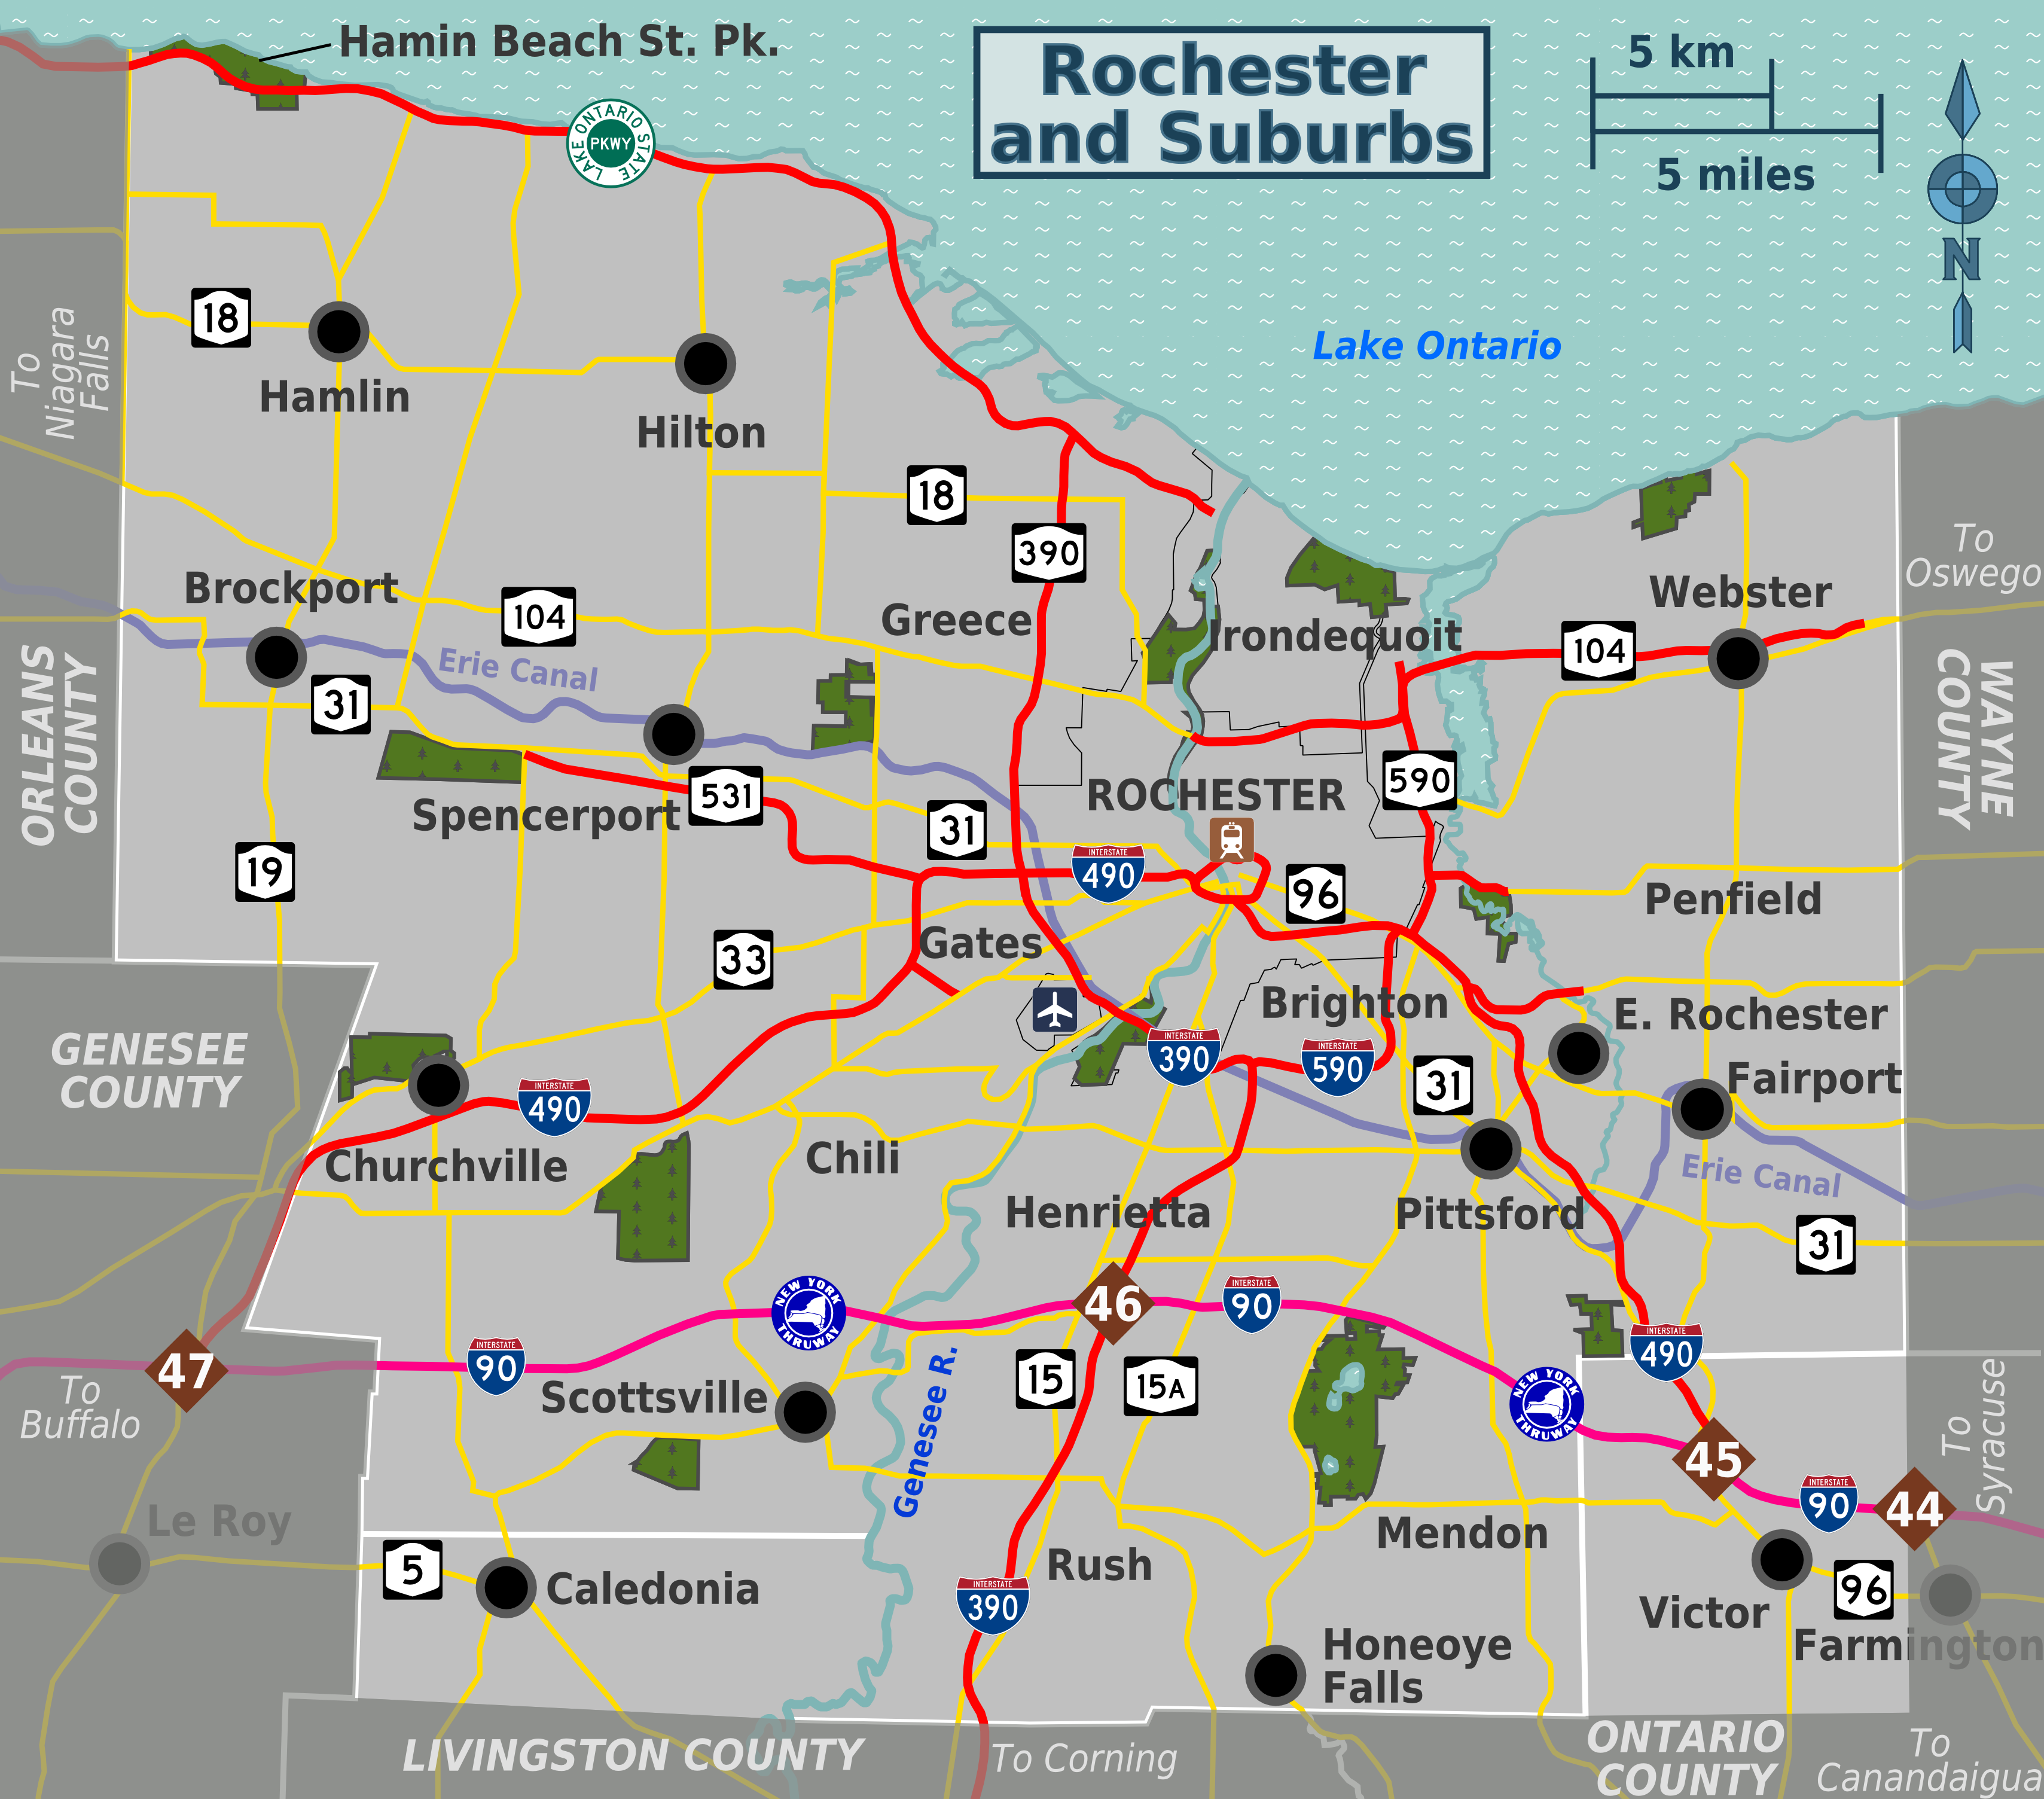 Map of Rochester neighborhoods